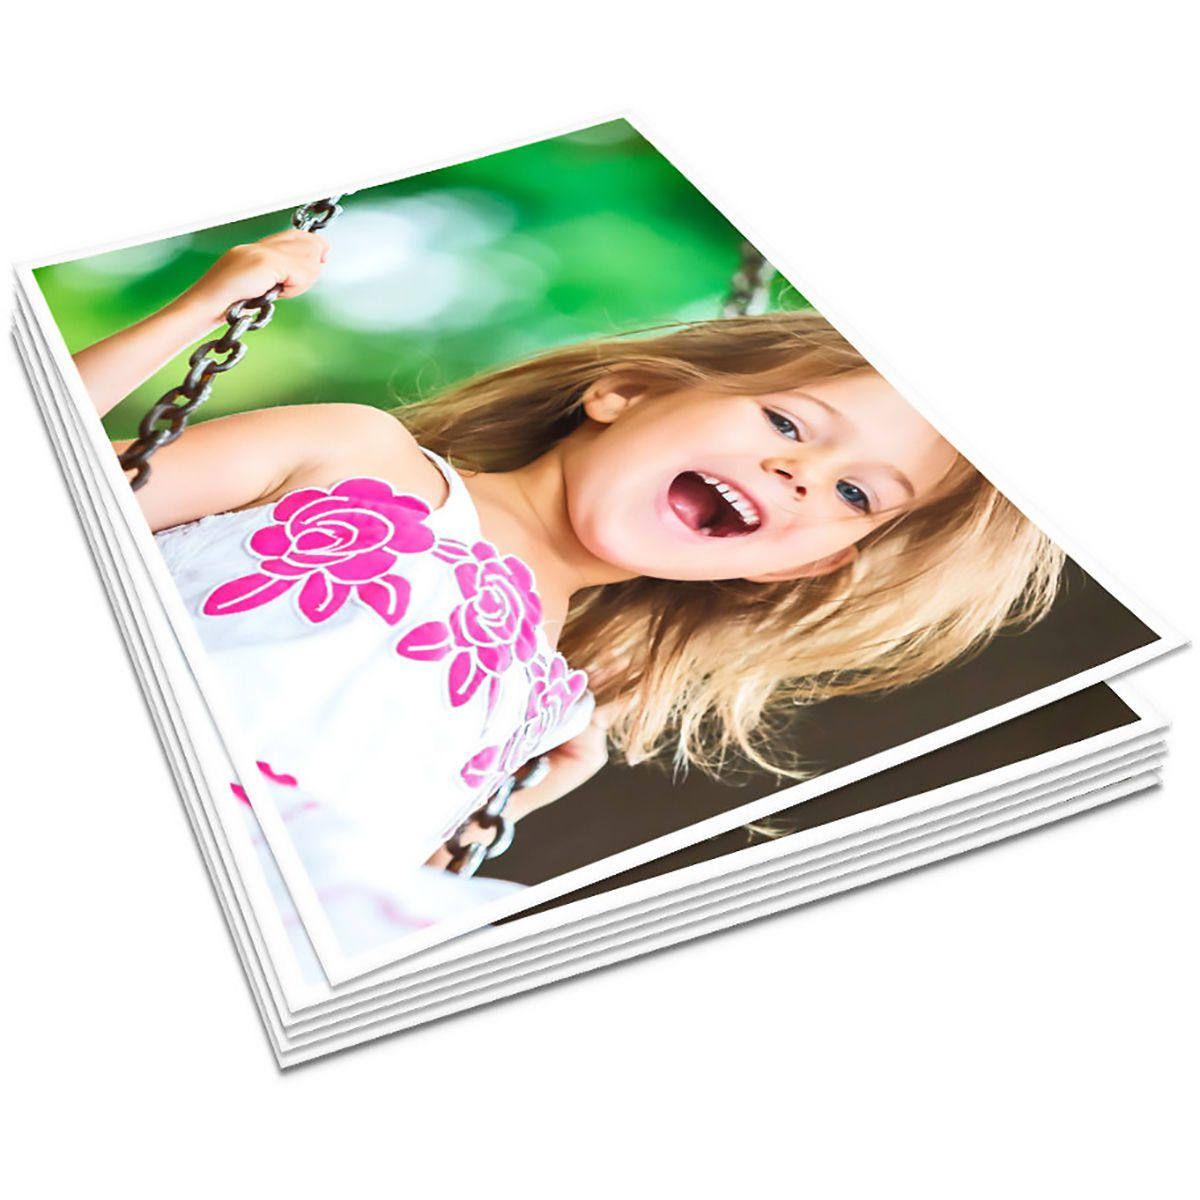 Papel Glossy Dupla Face 120g A4 Fotográfico Branco Brilhante Resistente à Água / 100 Folhas